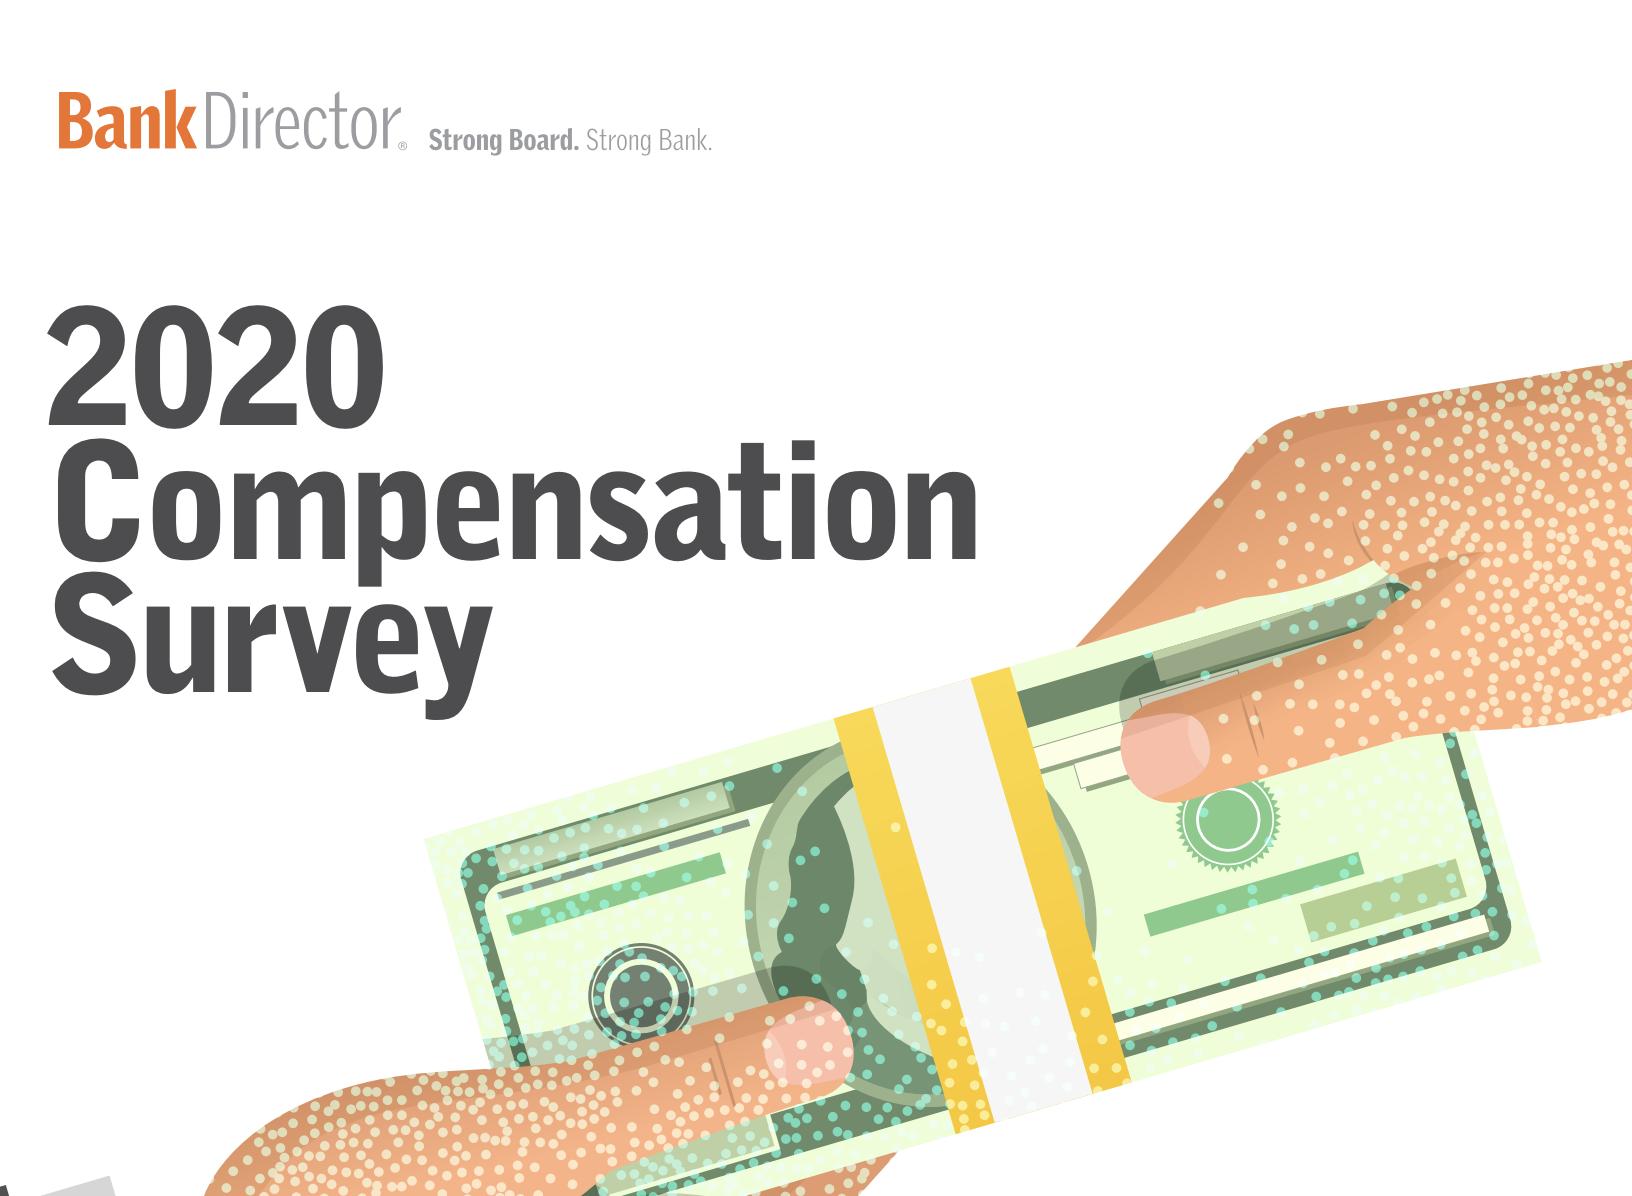 2020 Bank Director Compensation Survey Sponsored by Newcleus Compensation Advisors